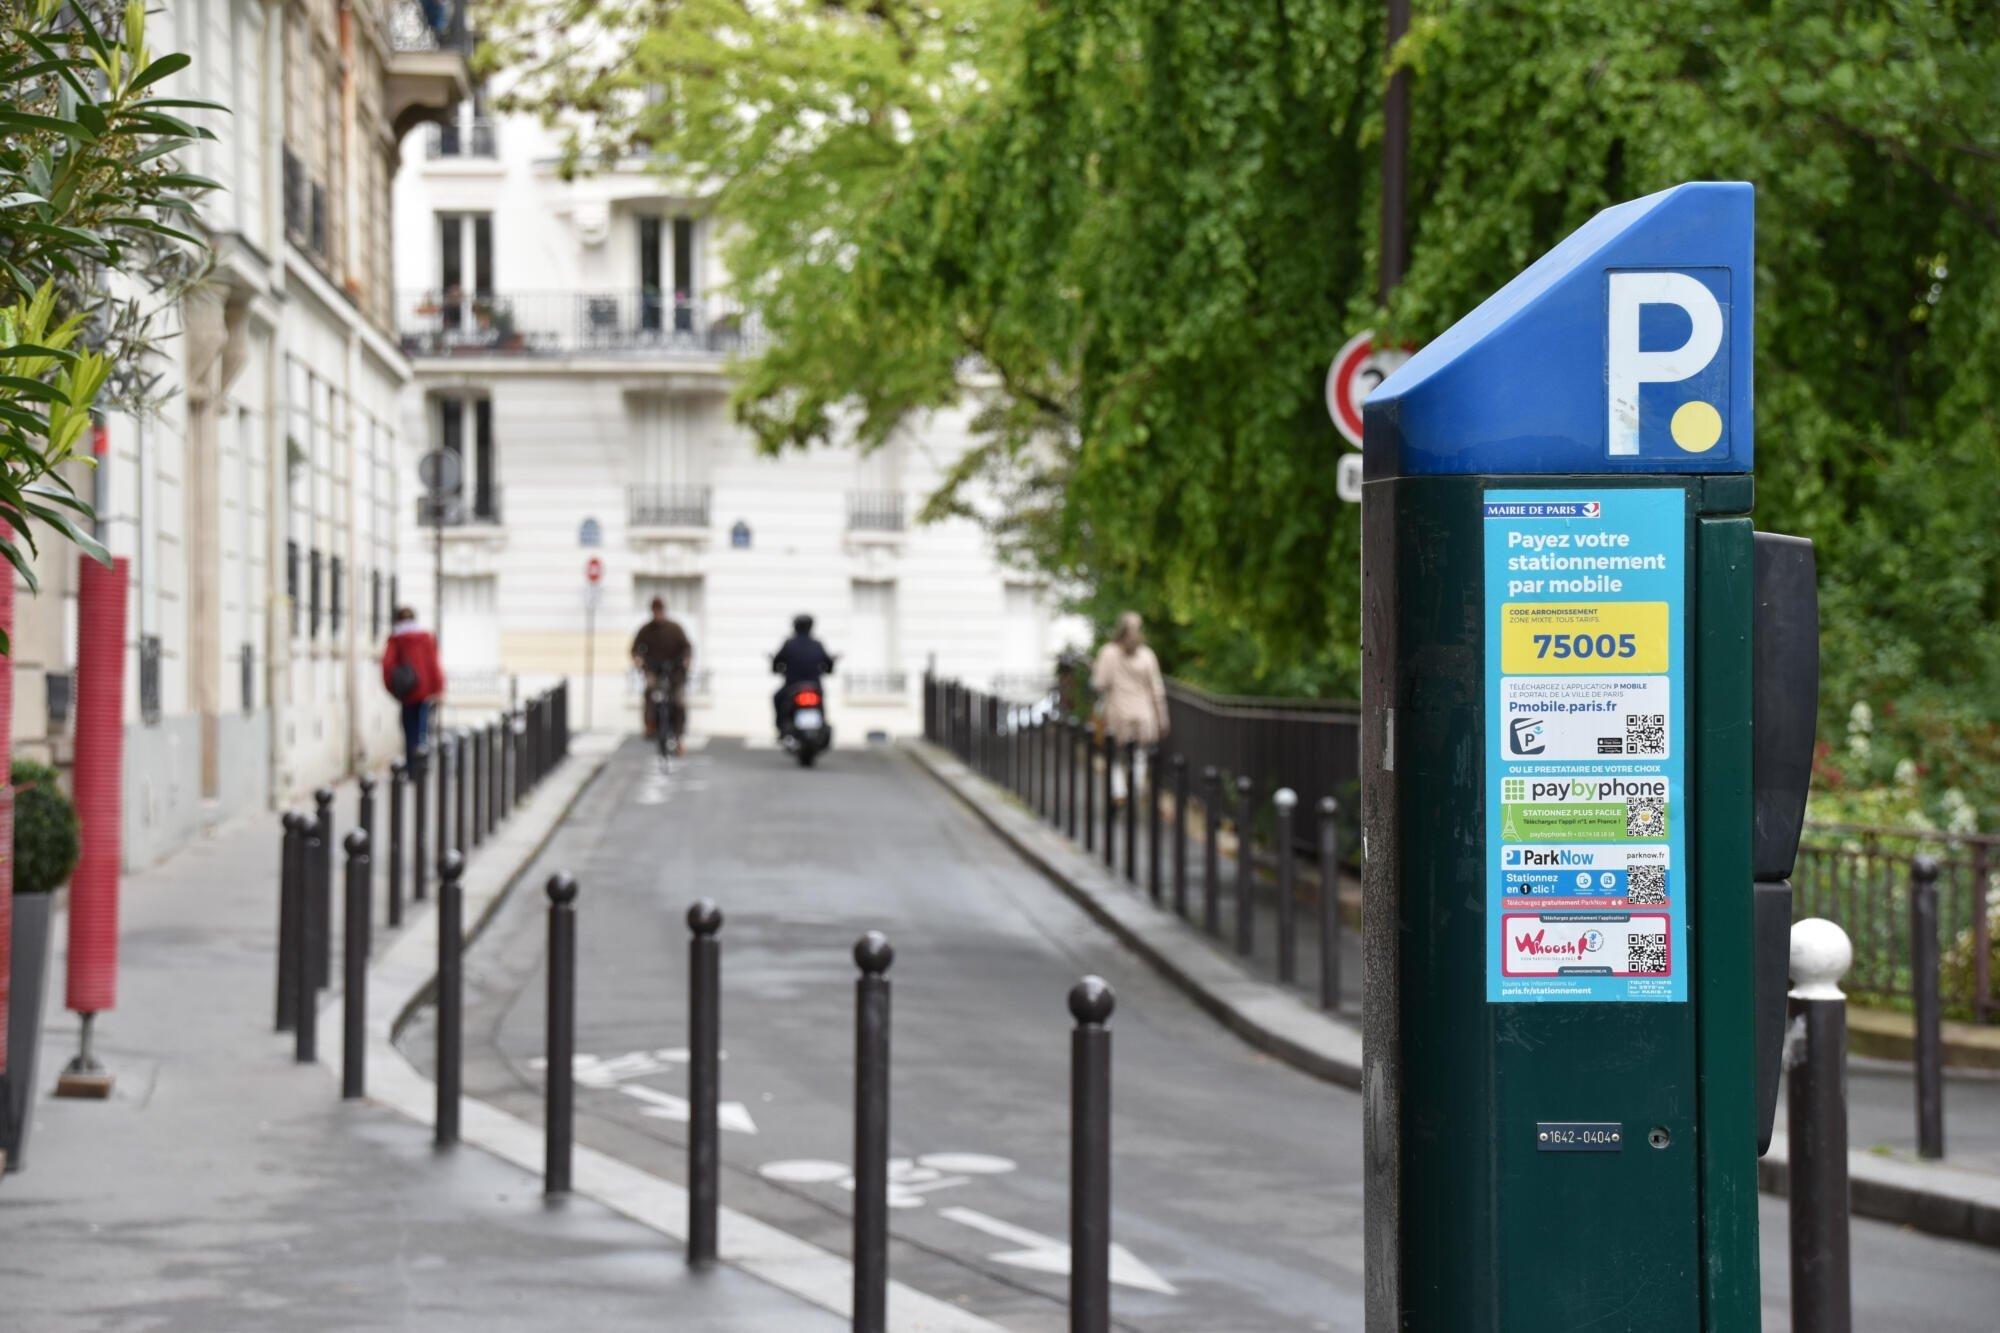 Paris is radically changing parking management